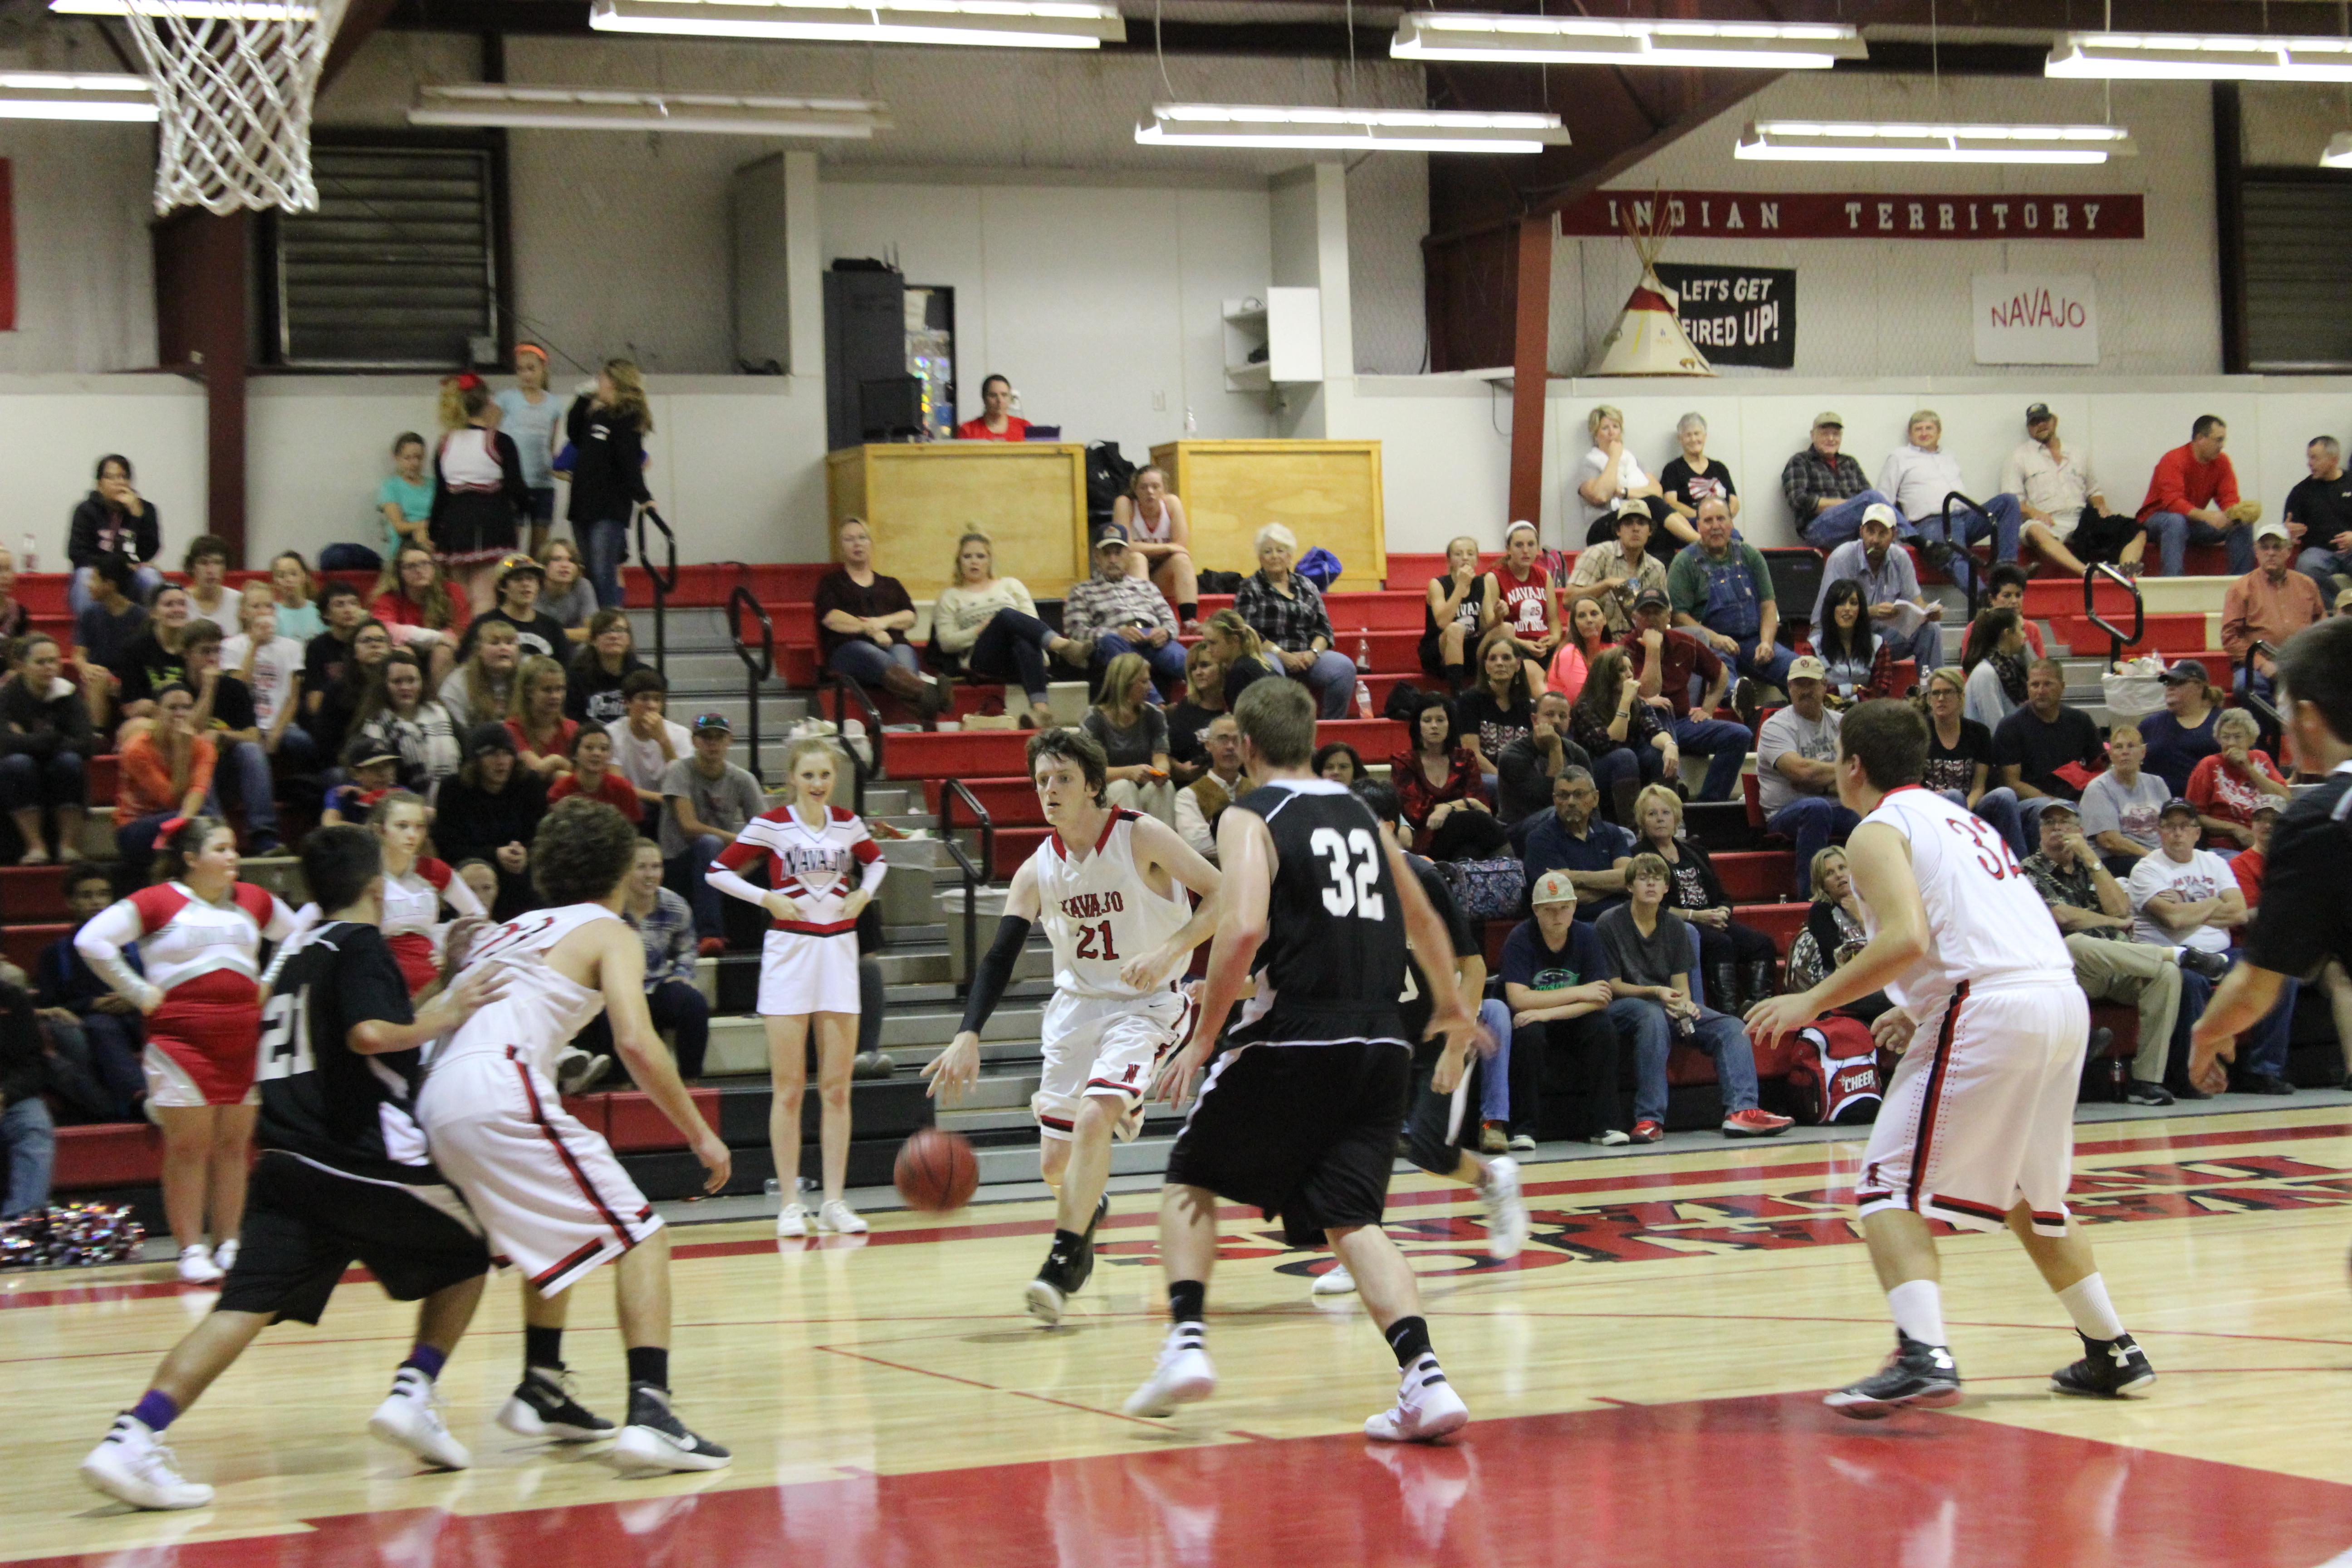 First-Home-Boys-Basketball-game-of-the-Season